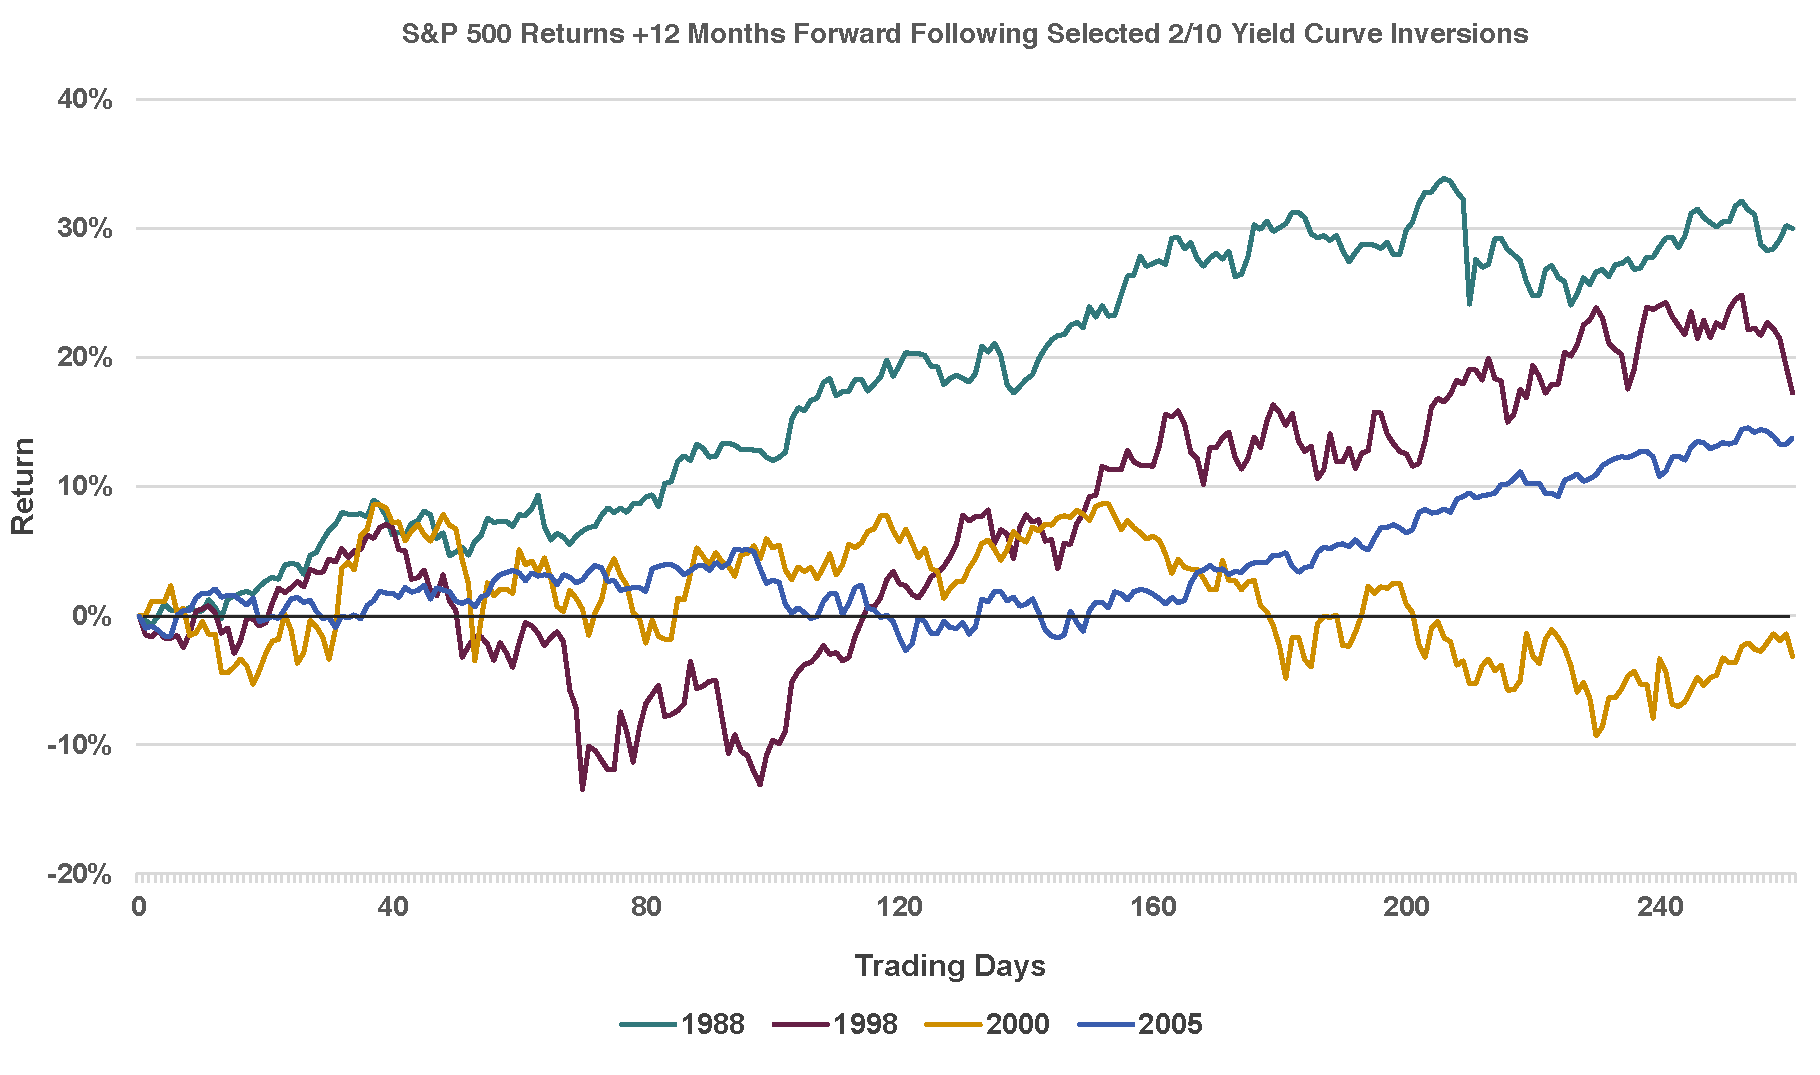 Recession and Inversion Curve